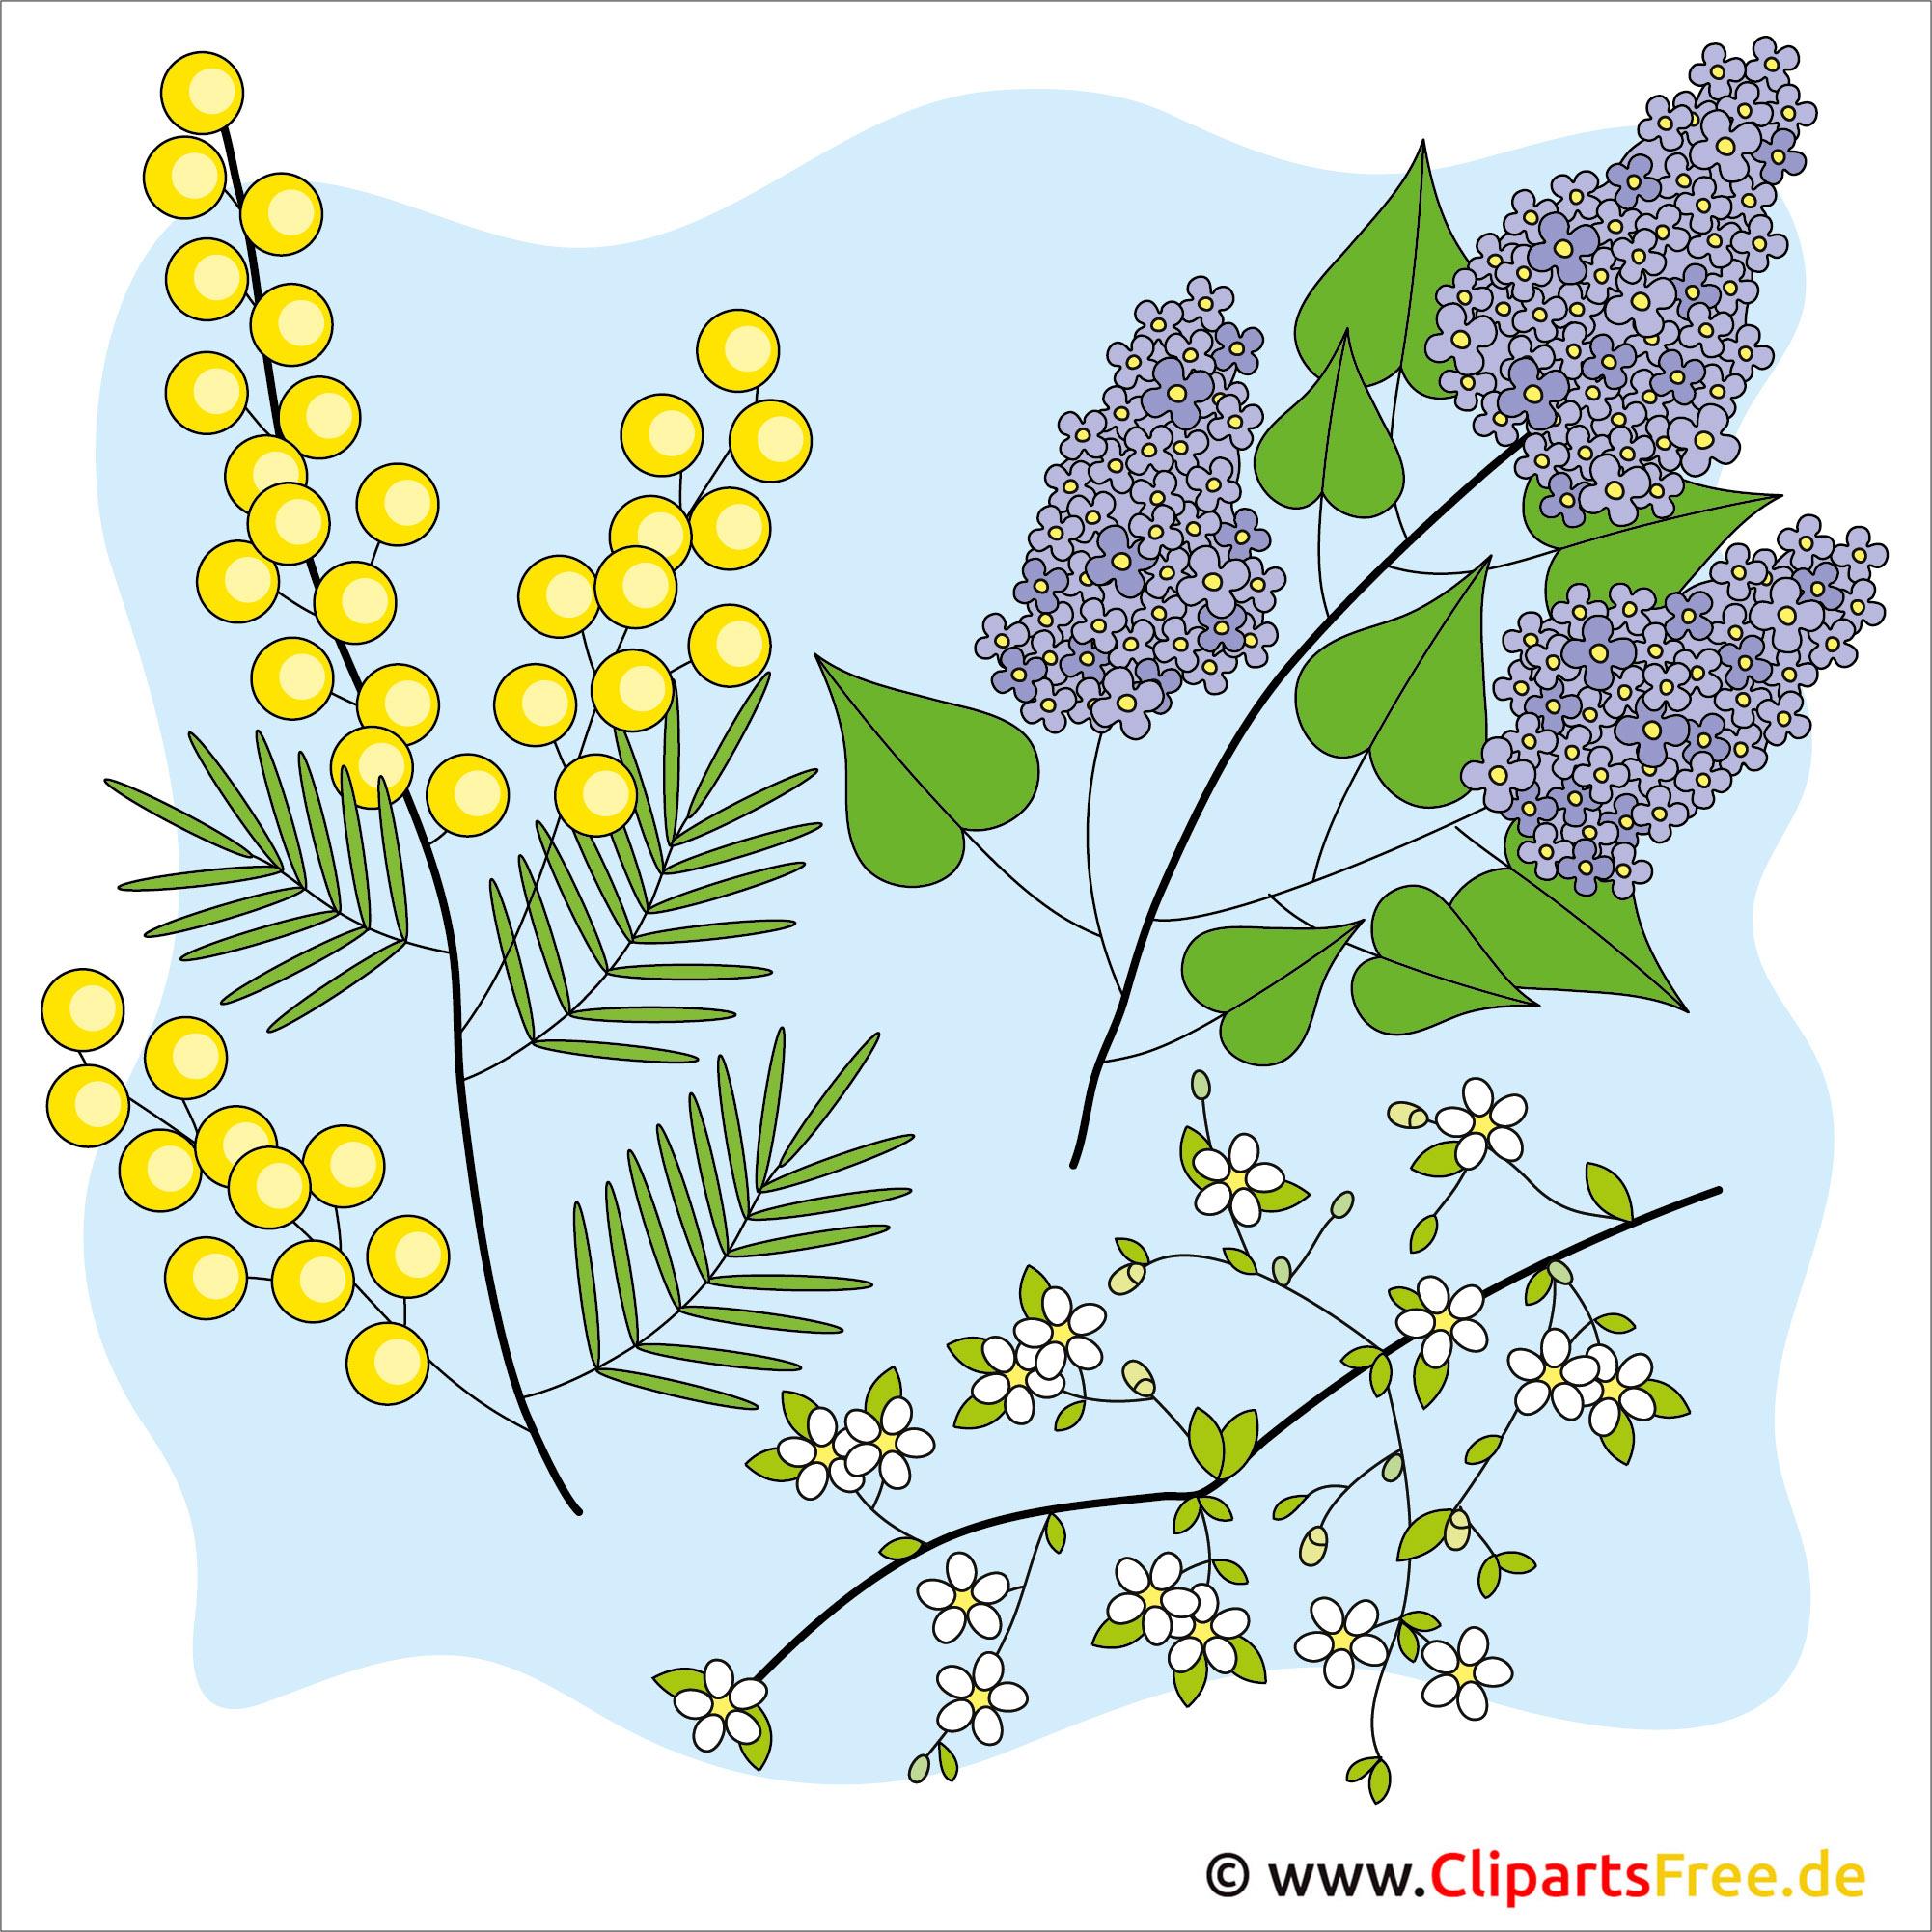 gratis pflanzen